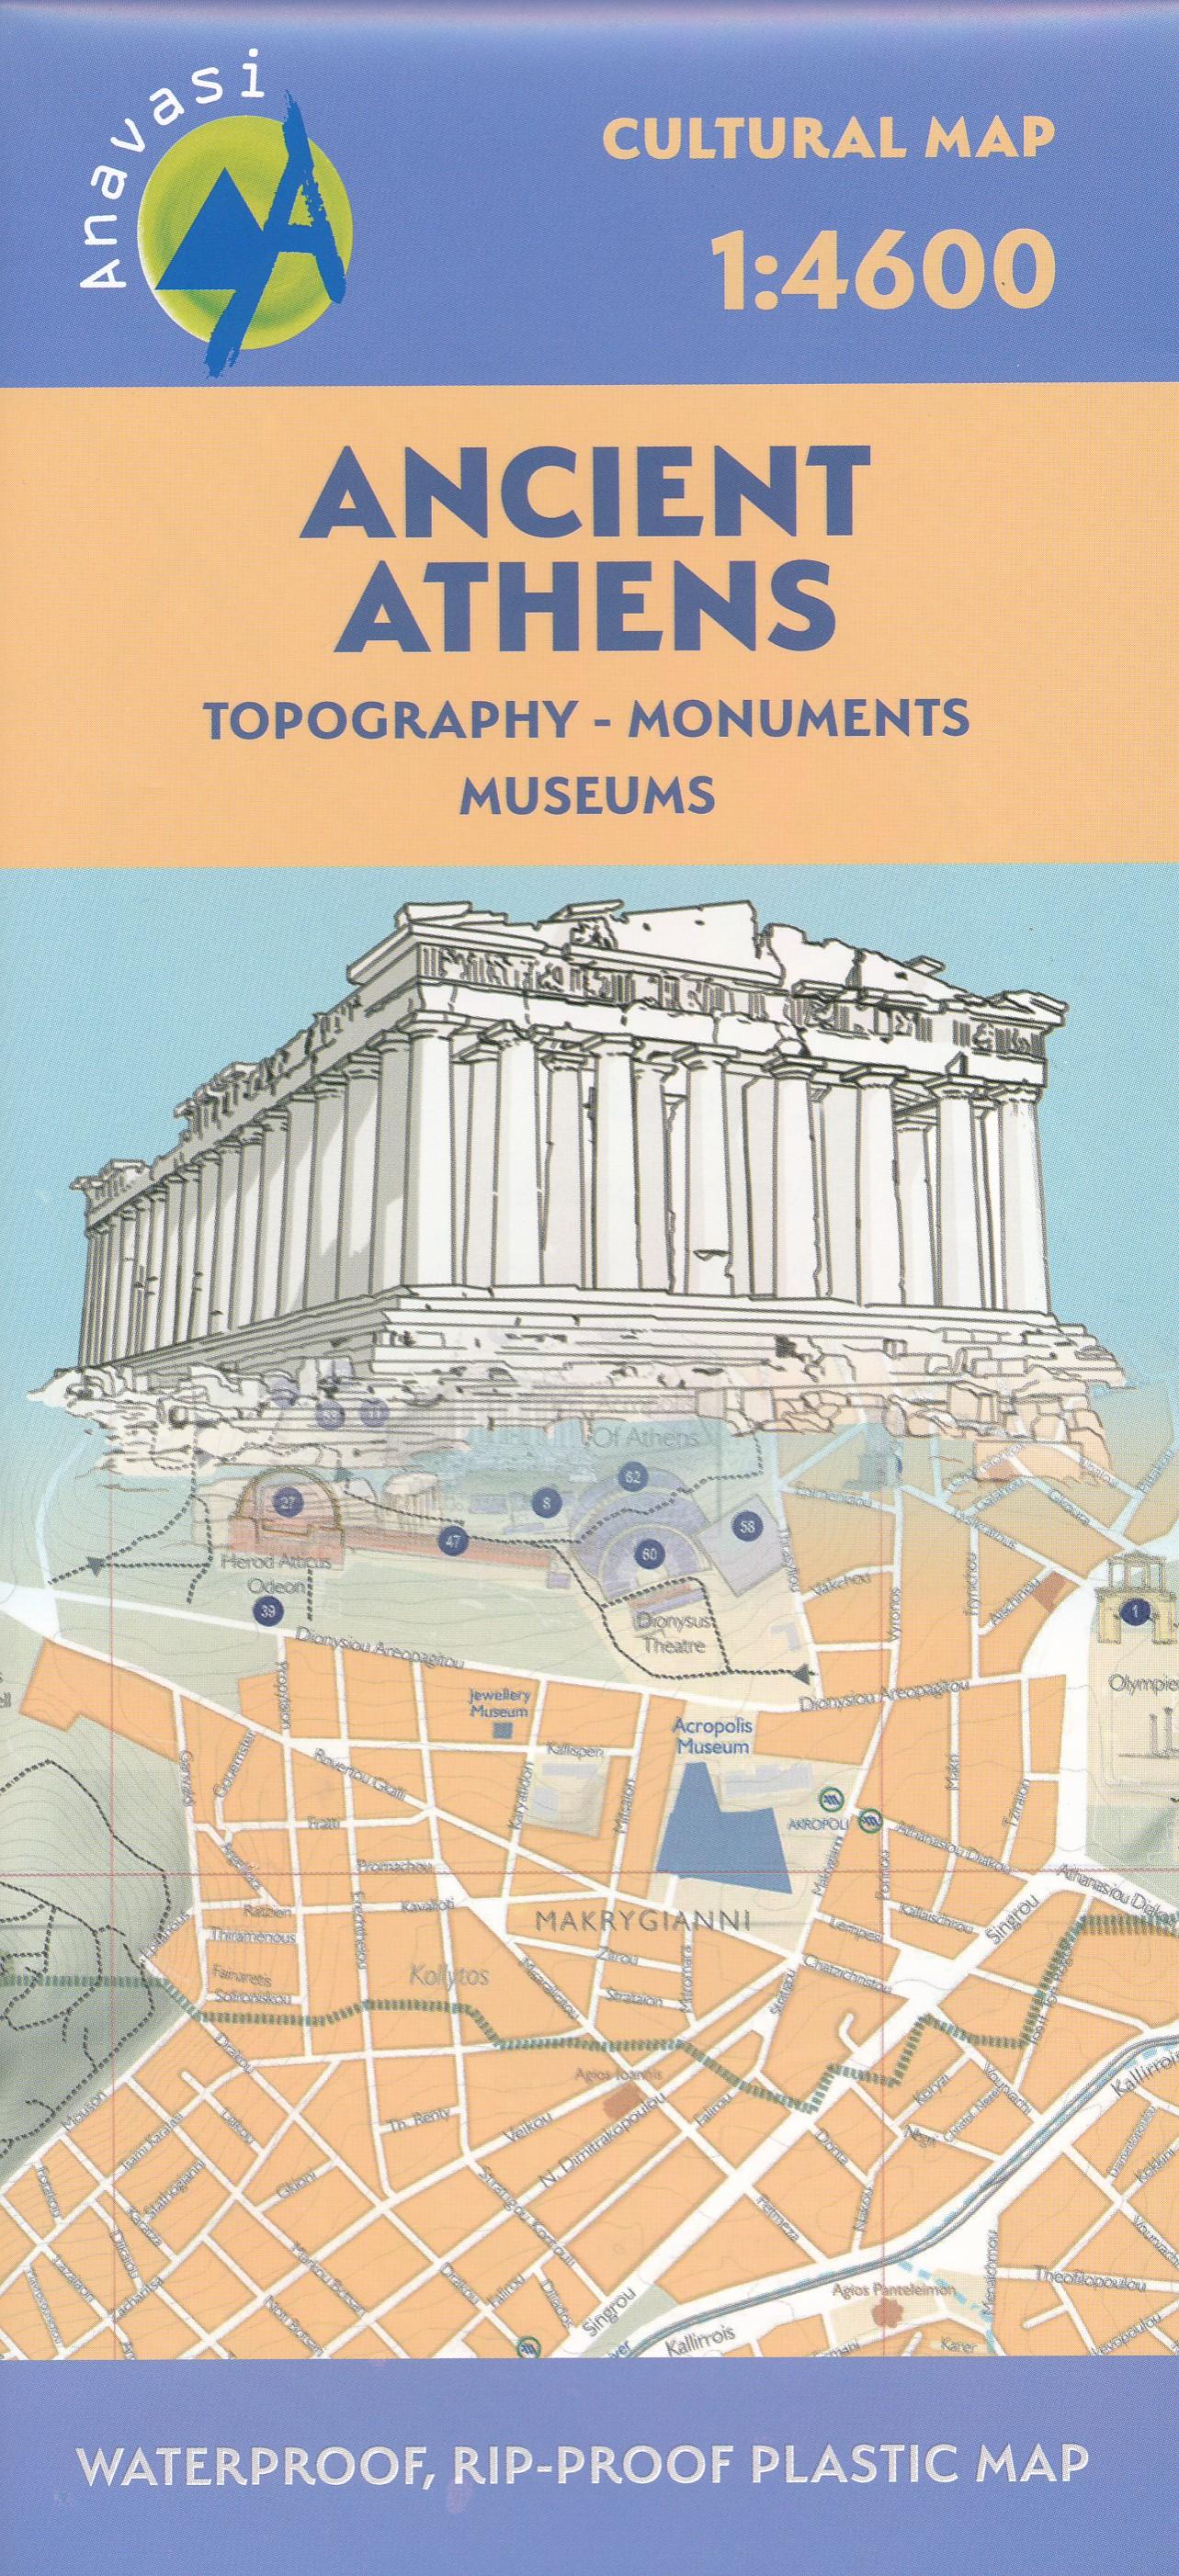 Stadsplattegrond Athene ancient and modern - oud en nieuw | Anavasi